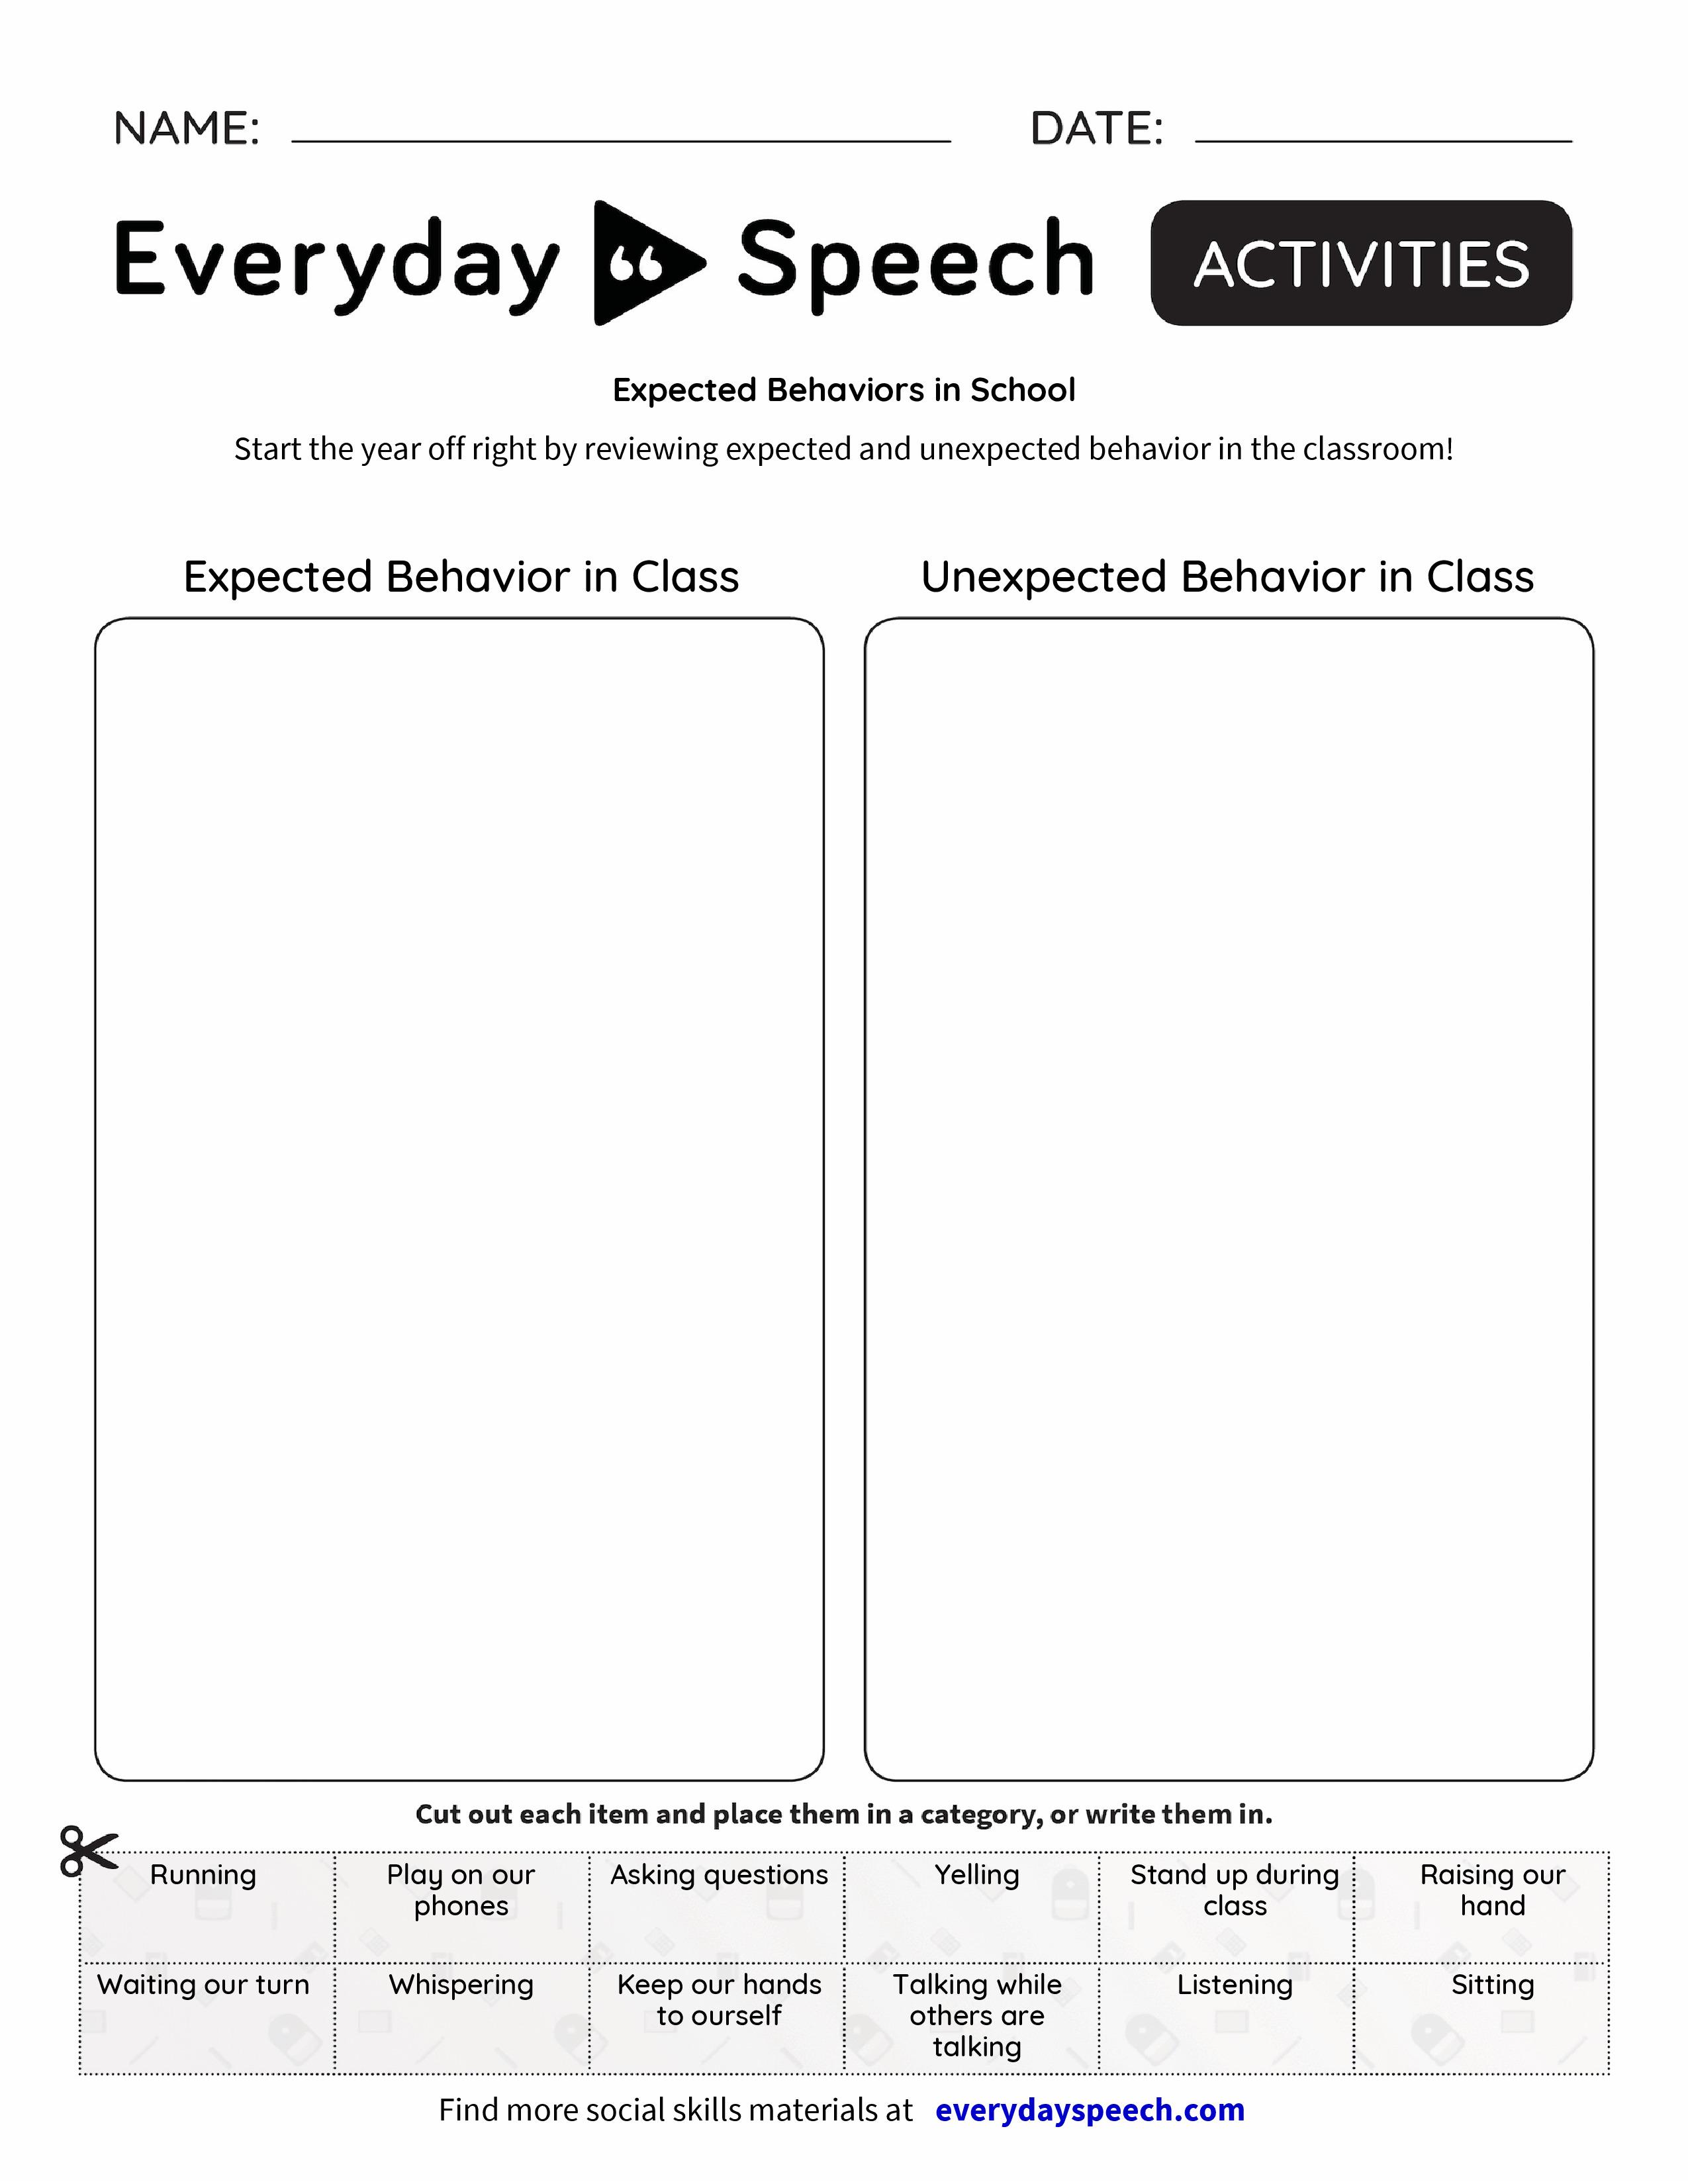 Expected Behaviors in School - Everyday Speech - Everyday Speech